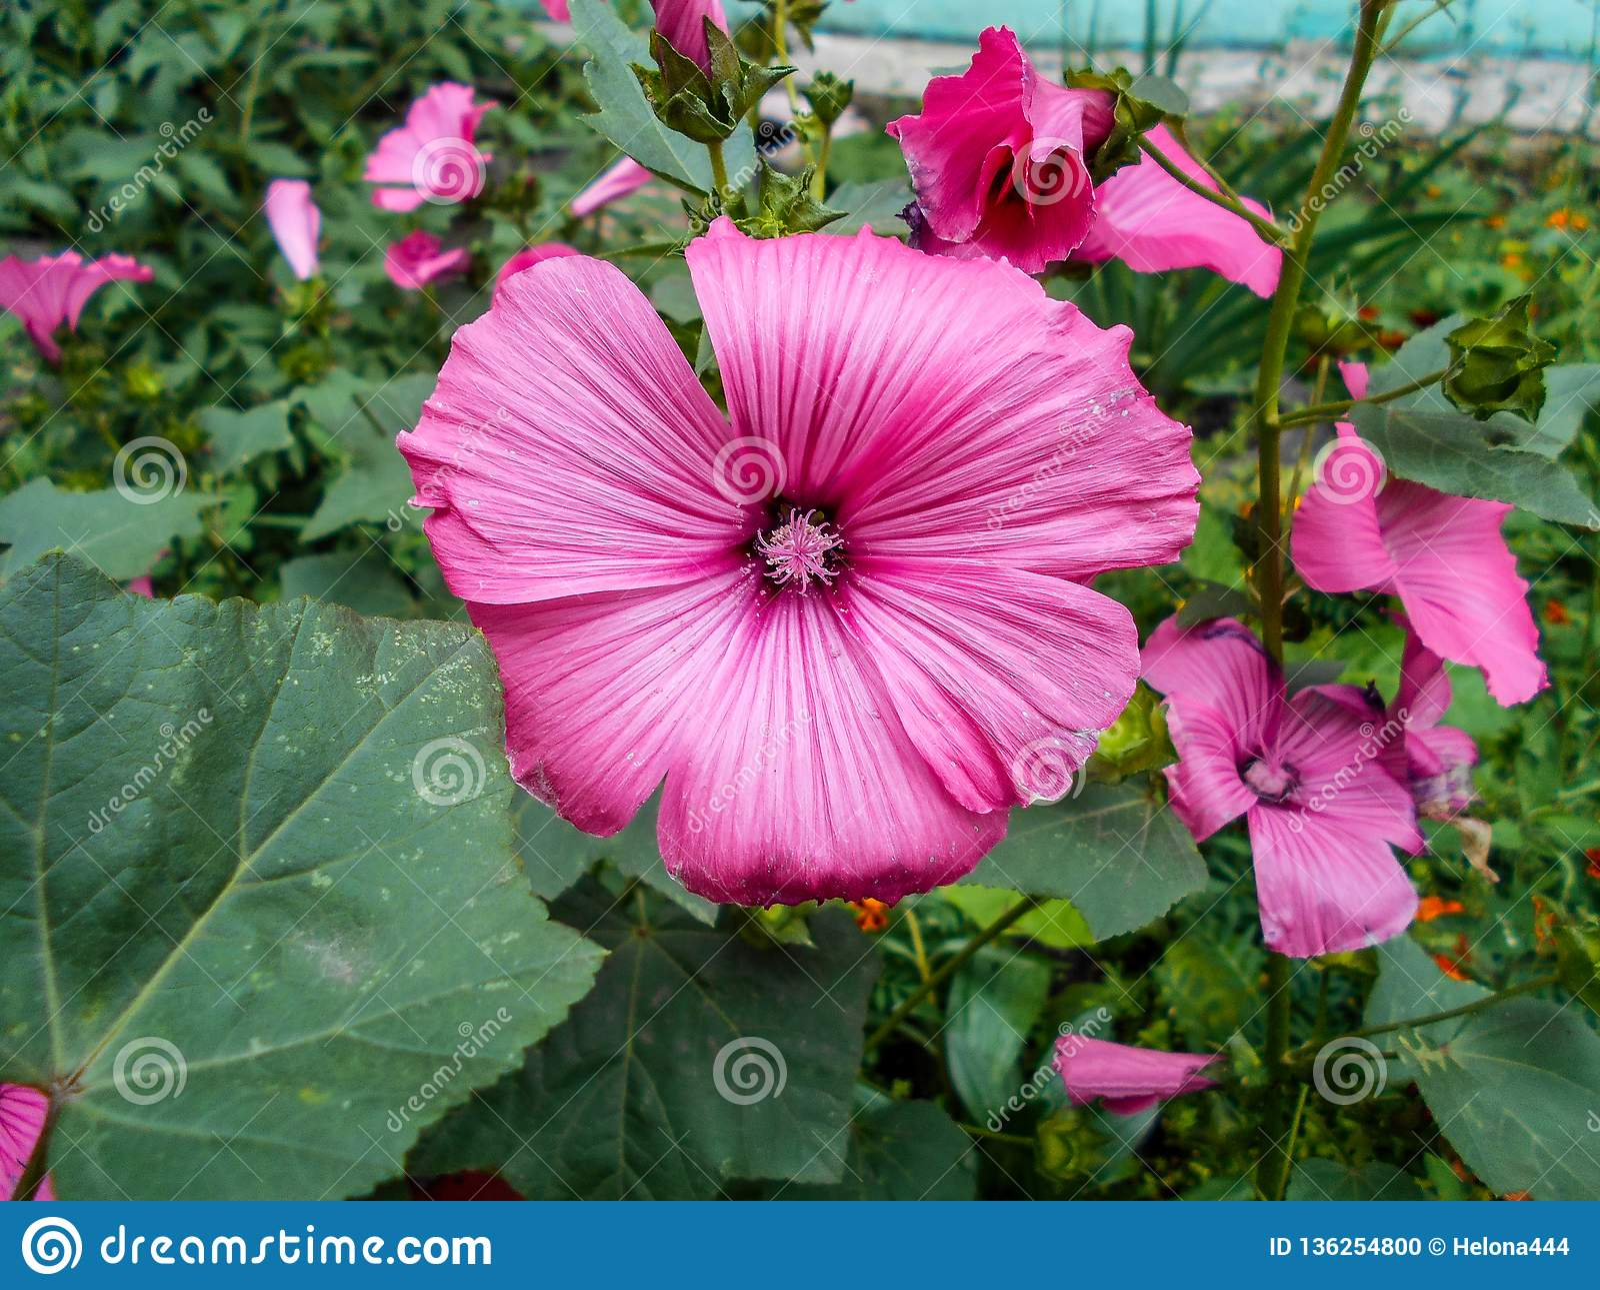 Lavatera Bloemen in de tuin Lavateratrimestris Gevoelige bloemen Roze bloemen